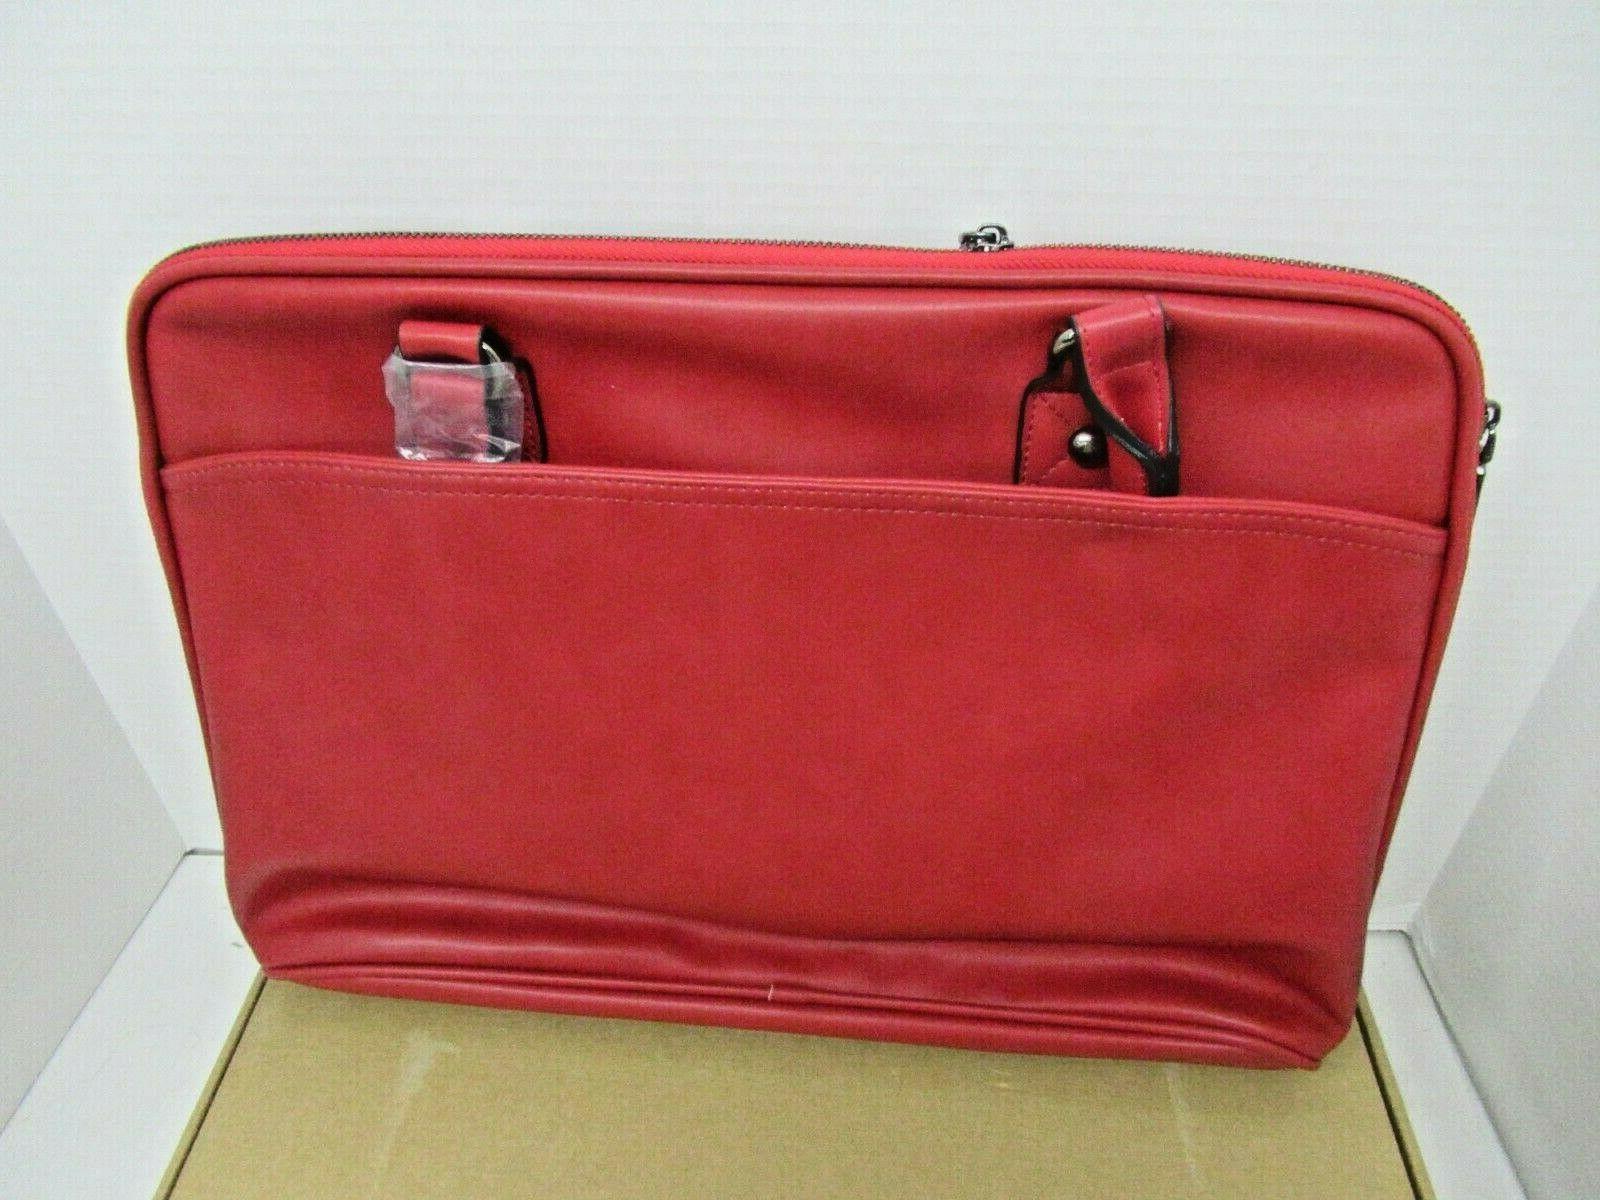 EDODAY 14-15.6 Laptop Bag for Open Laptop